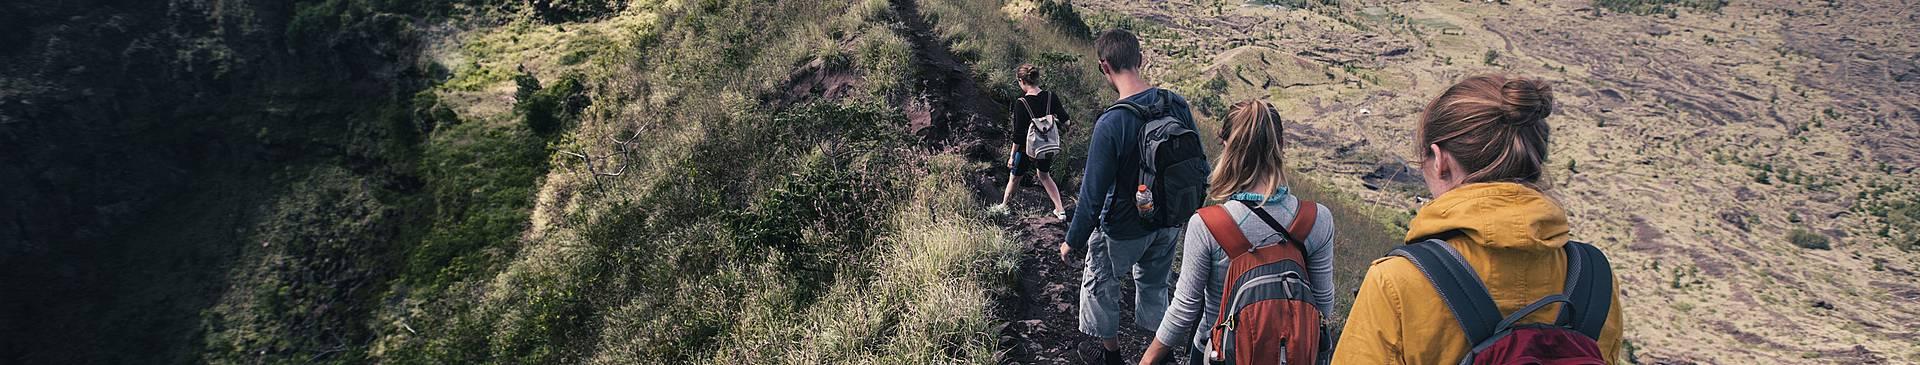 Voyage en groupe à Bali